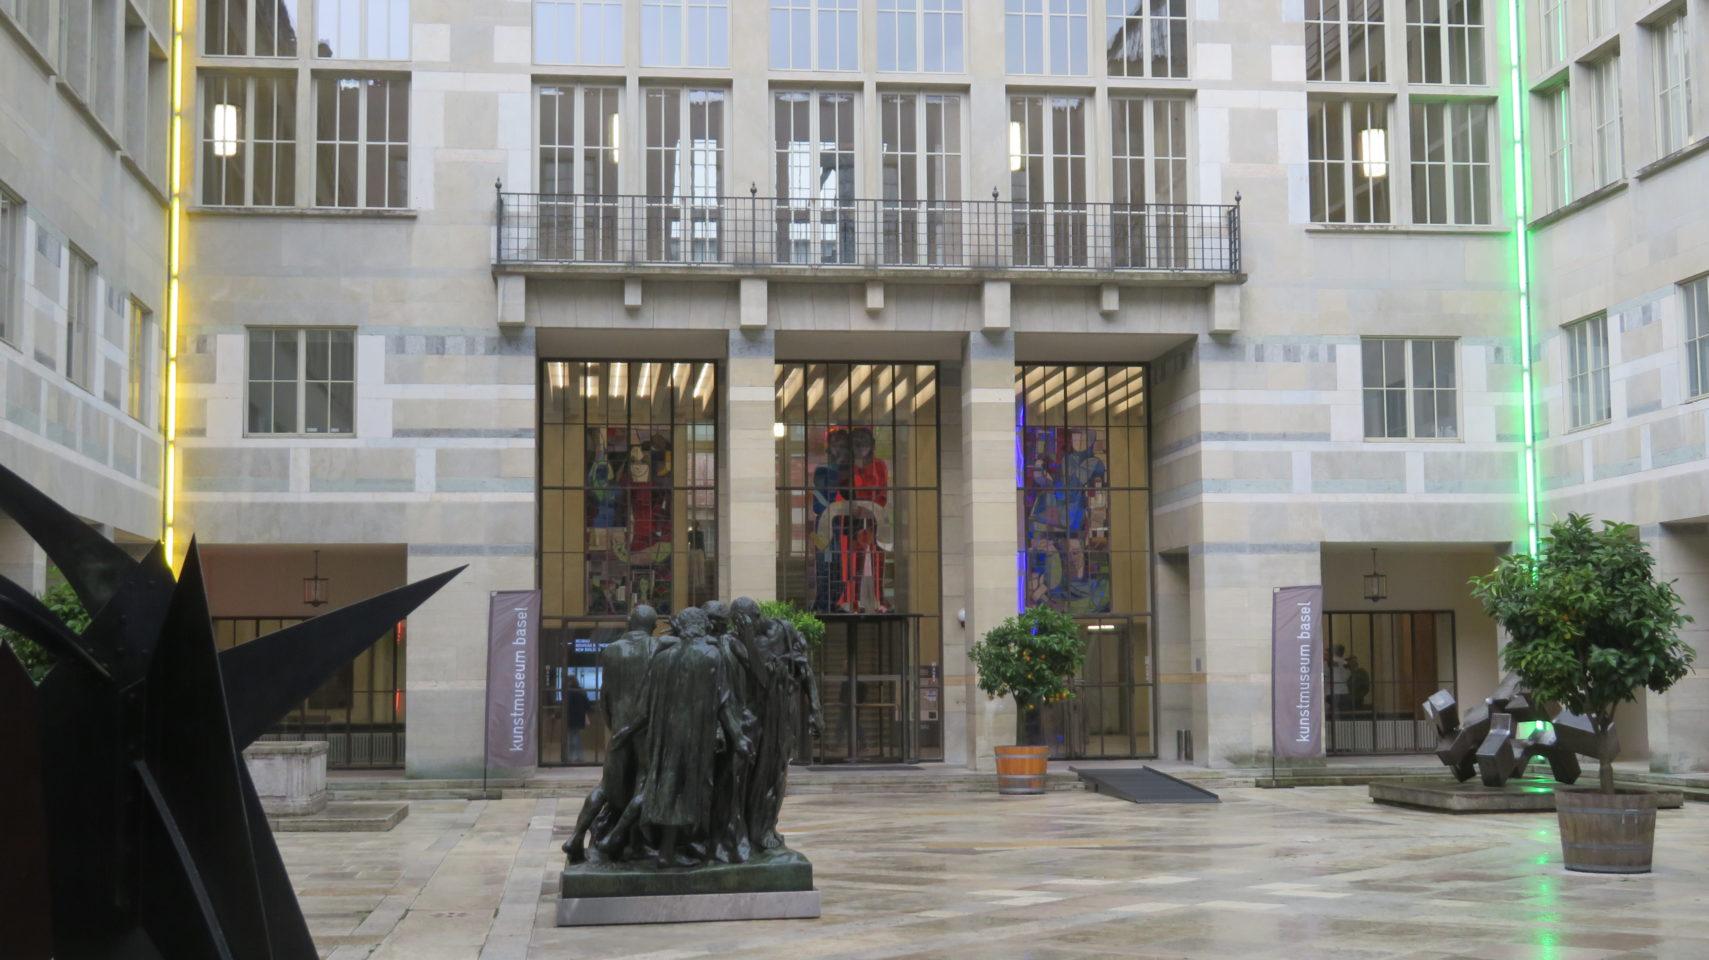 World-famous KunstMuseum in Basel, Switzerland